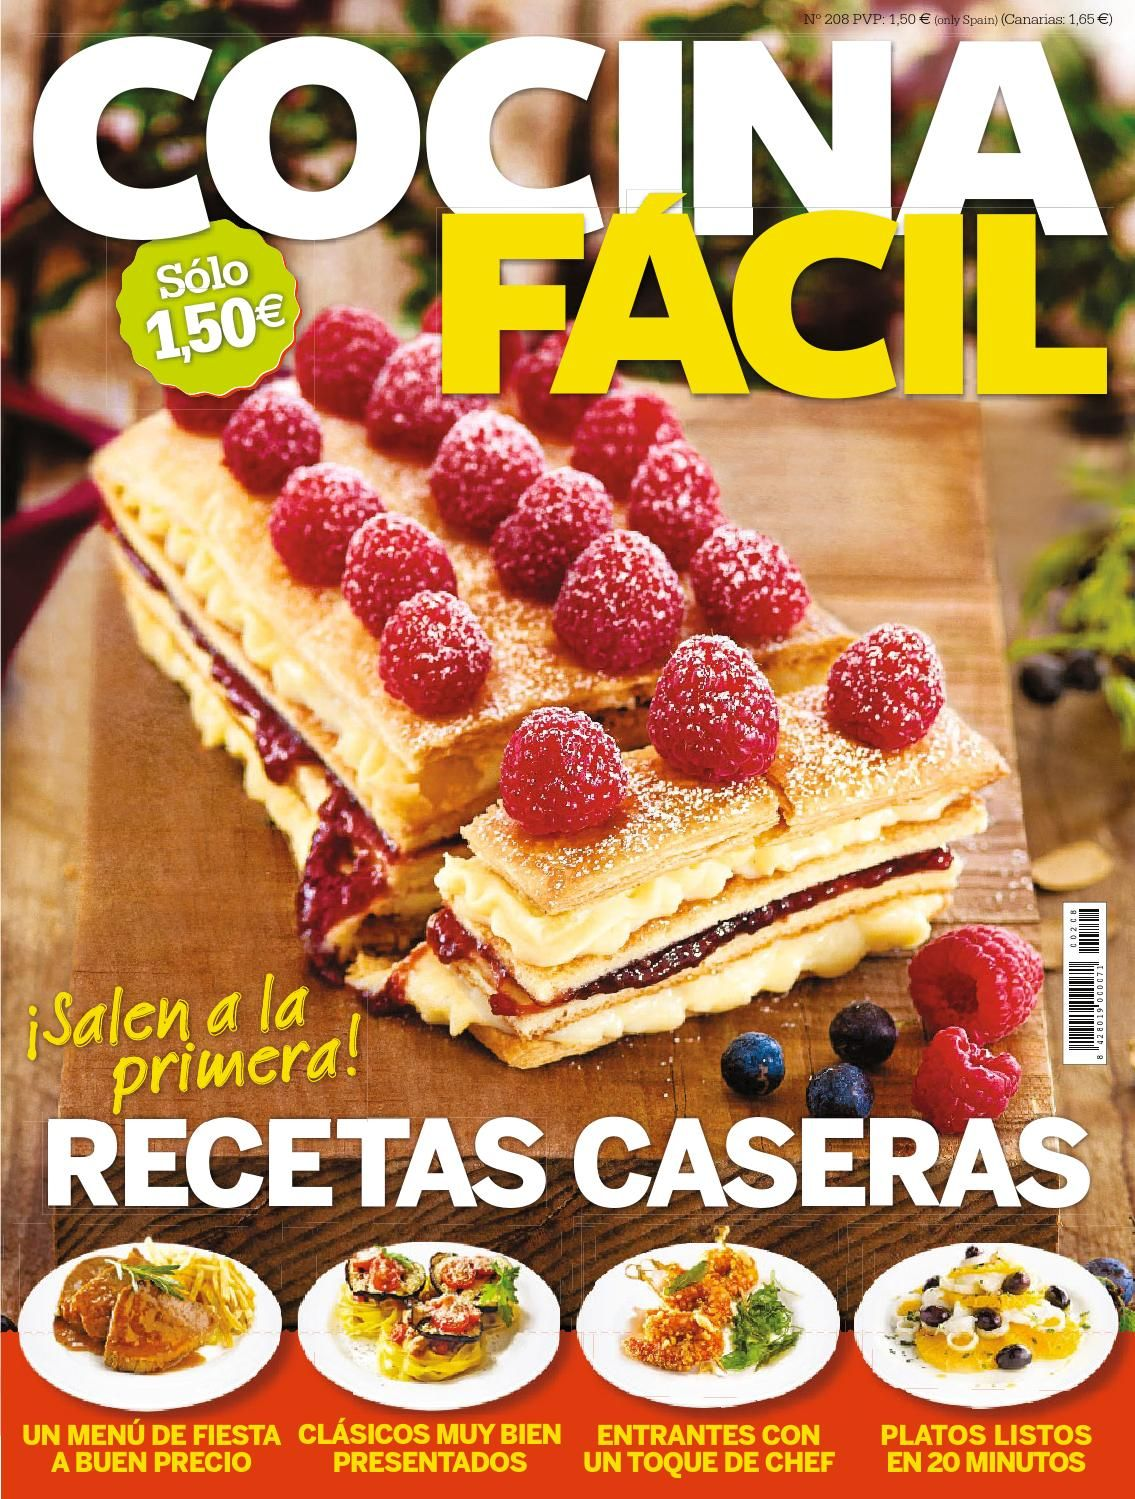 Revista cocina facil precio